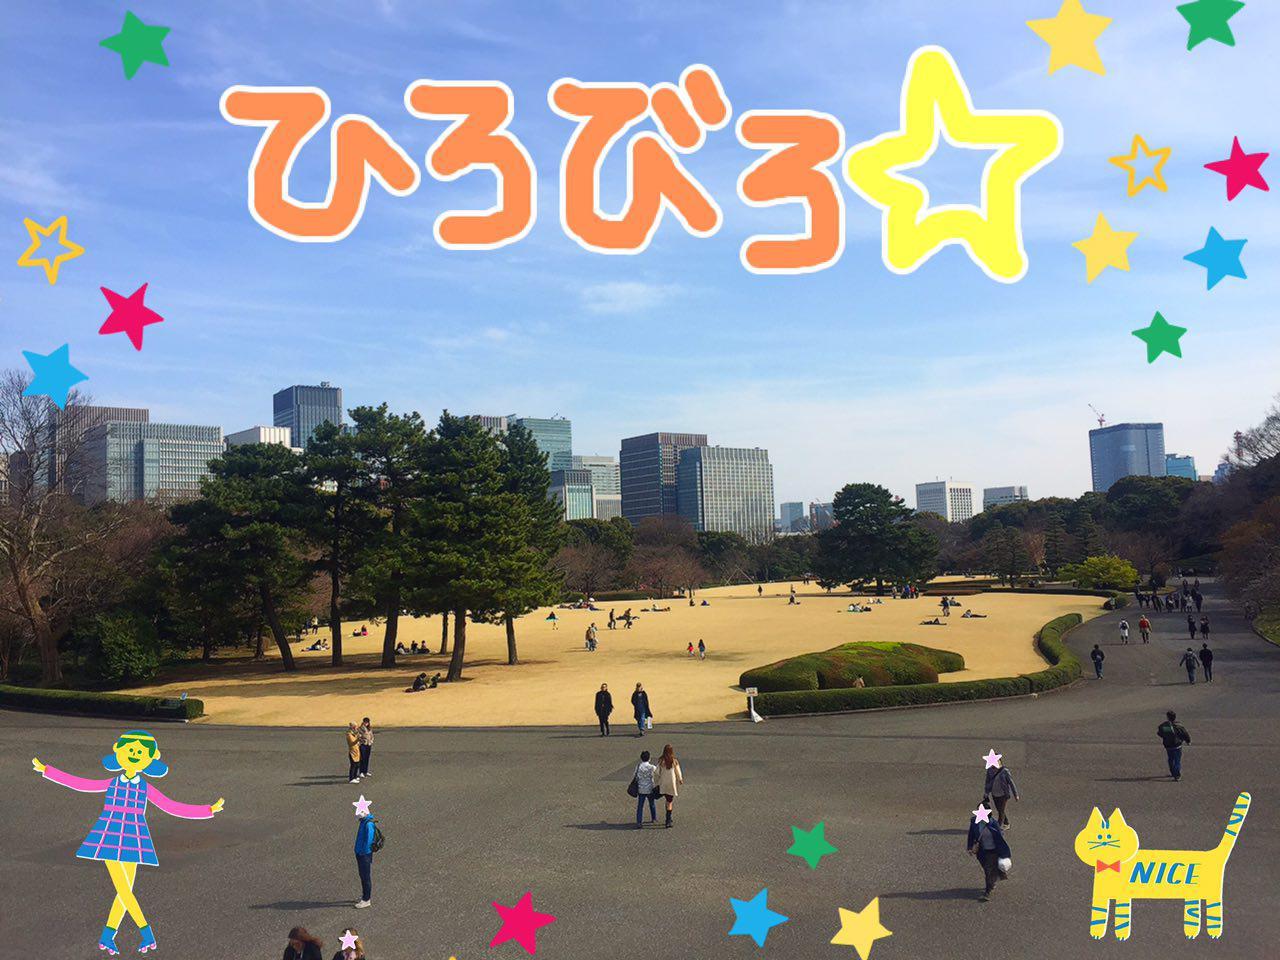 photo_2017-03-26_00-09-34.jpg